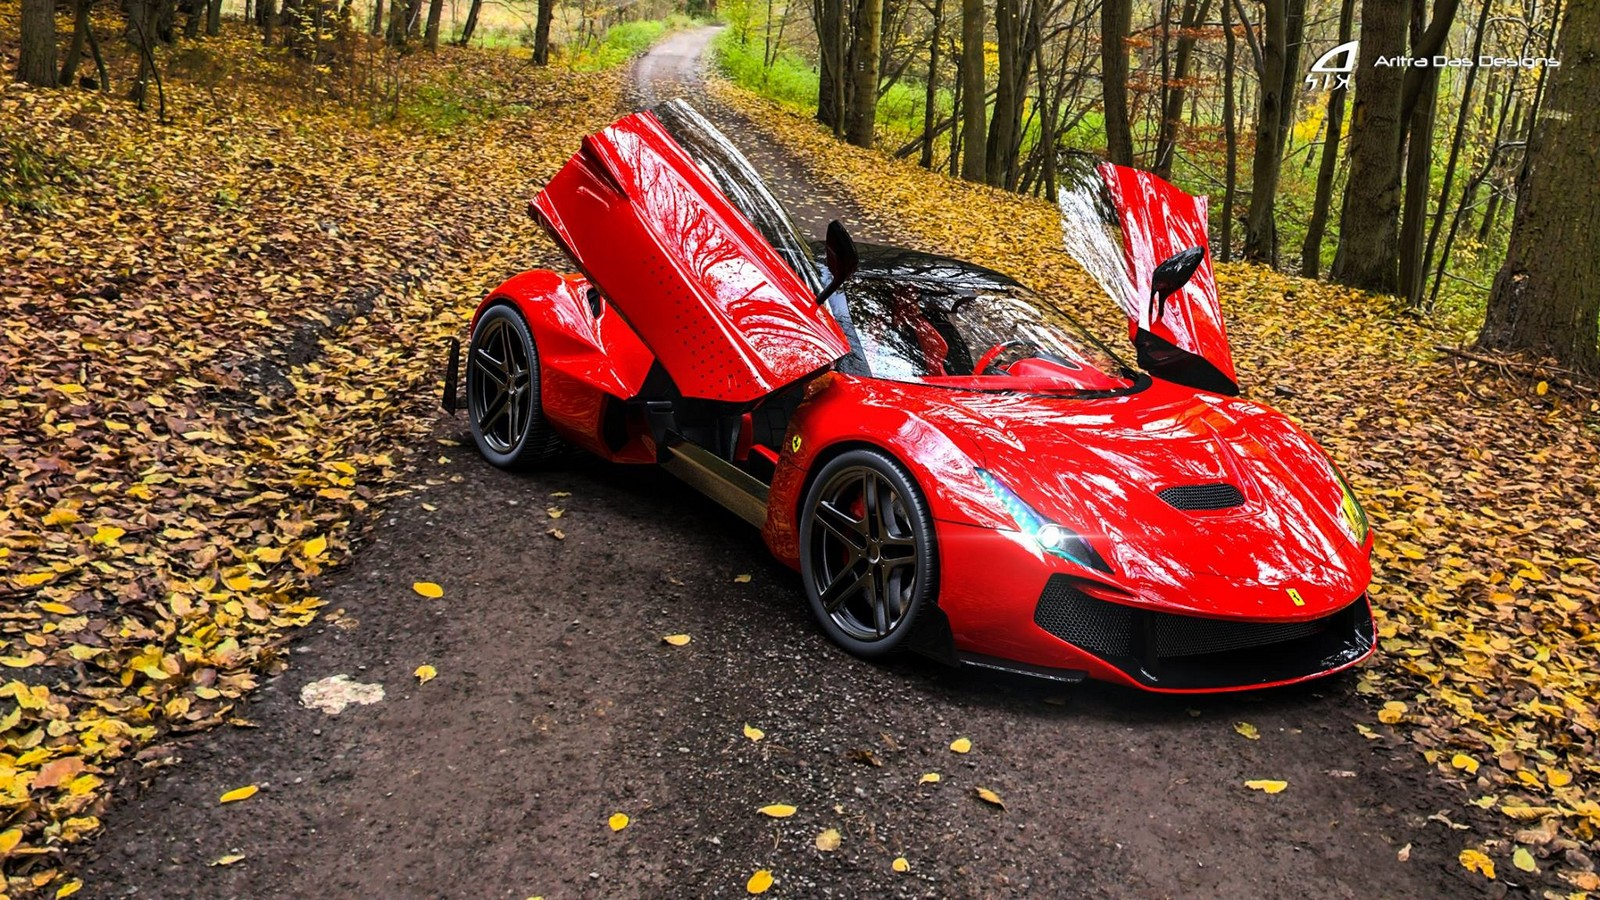 Ferrari Zenyatta Is A Designers Vision For A New Hypercar